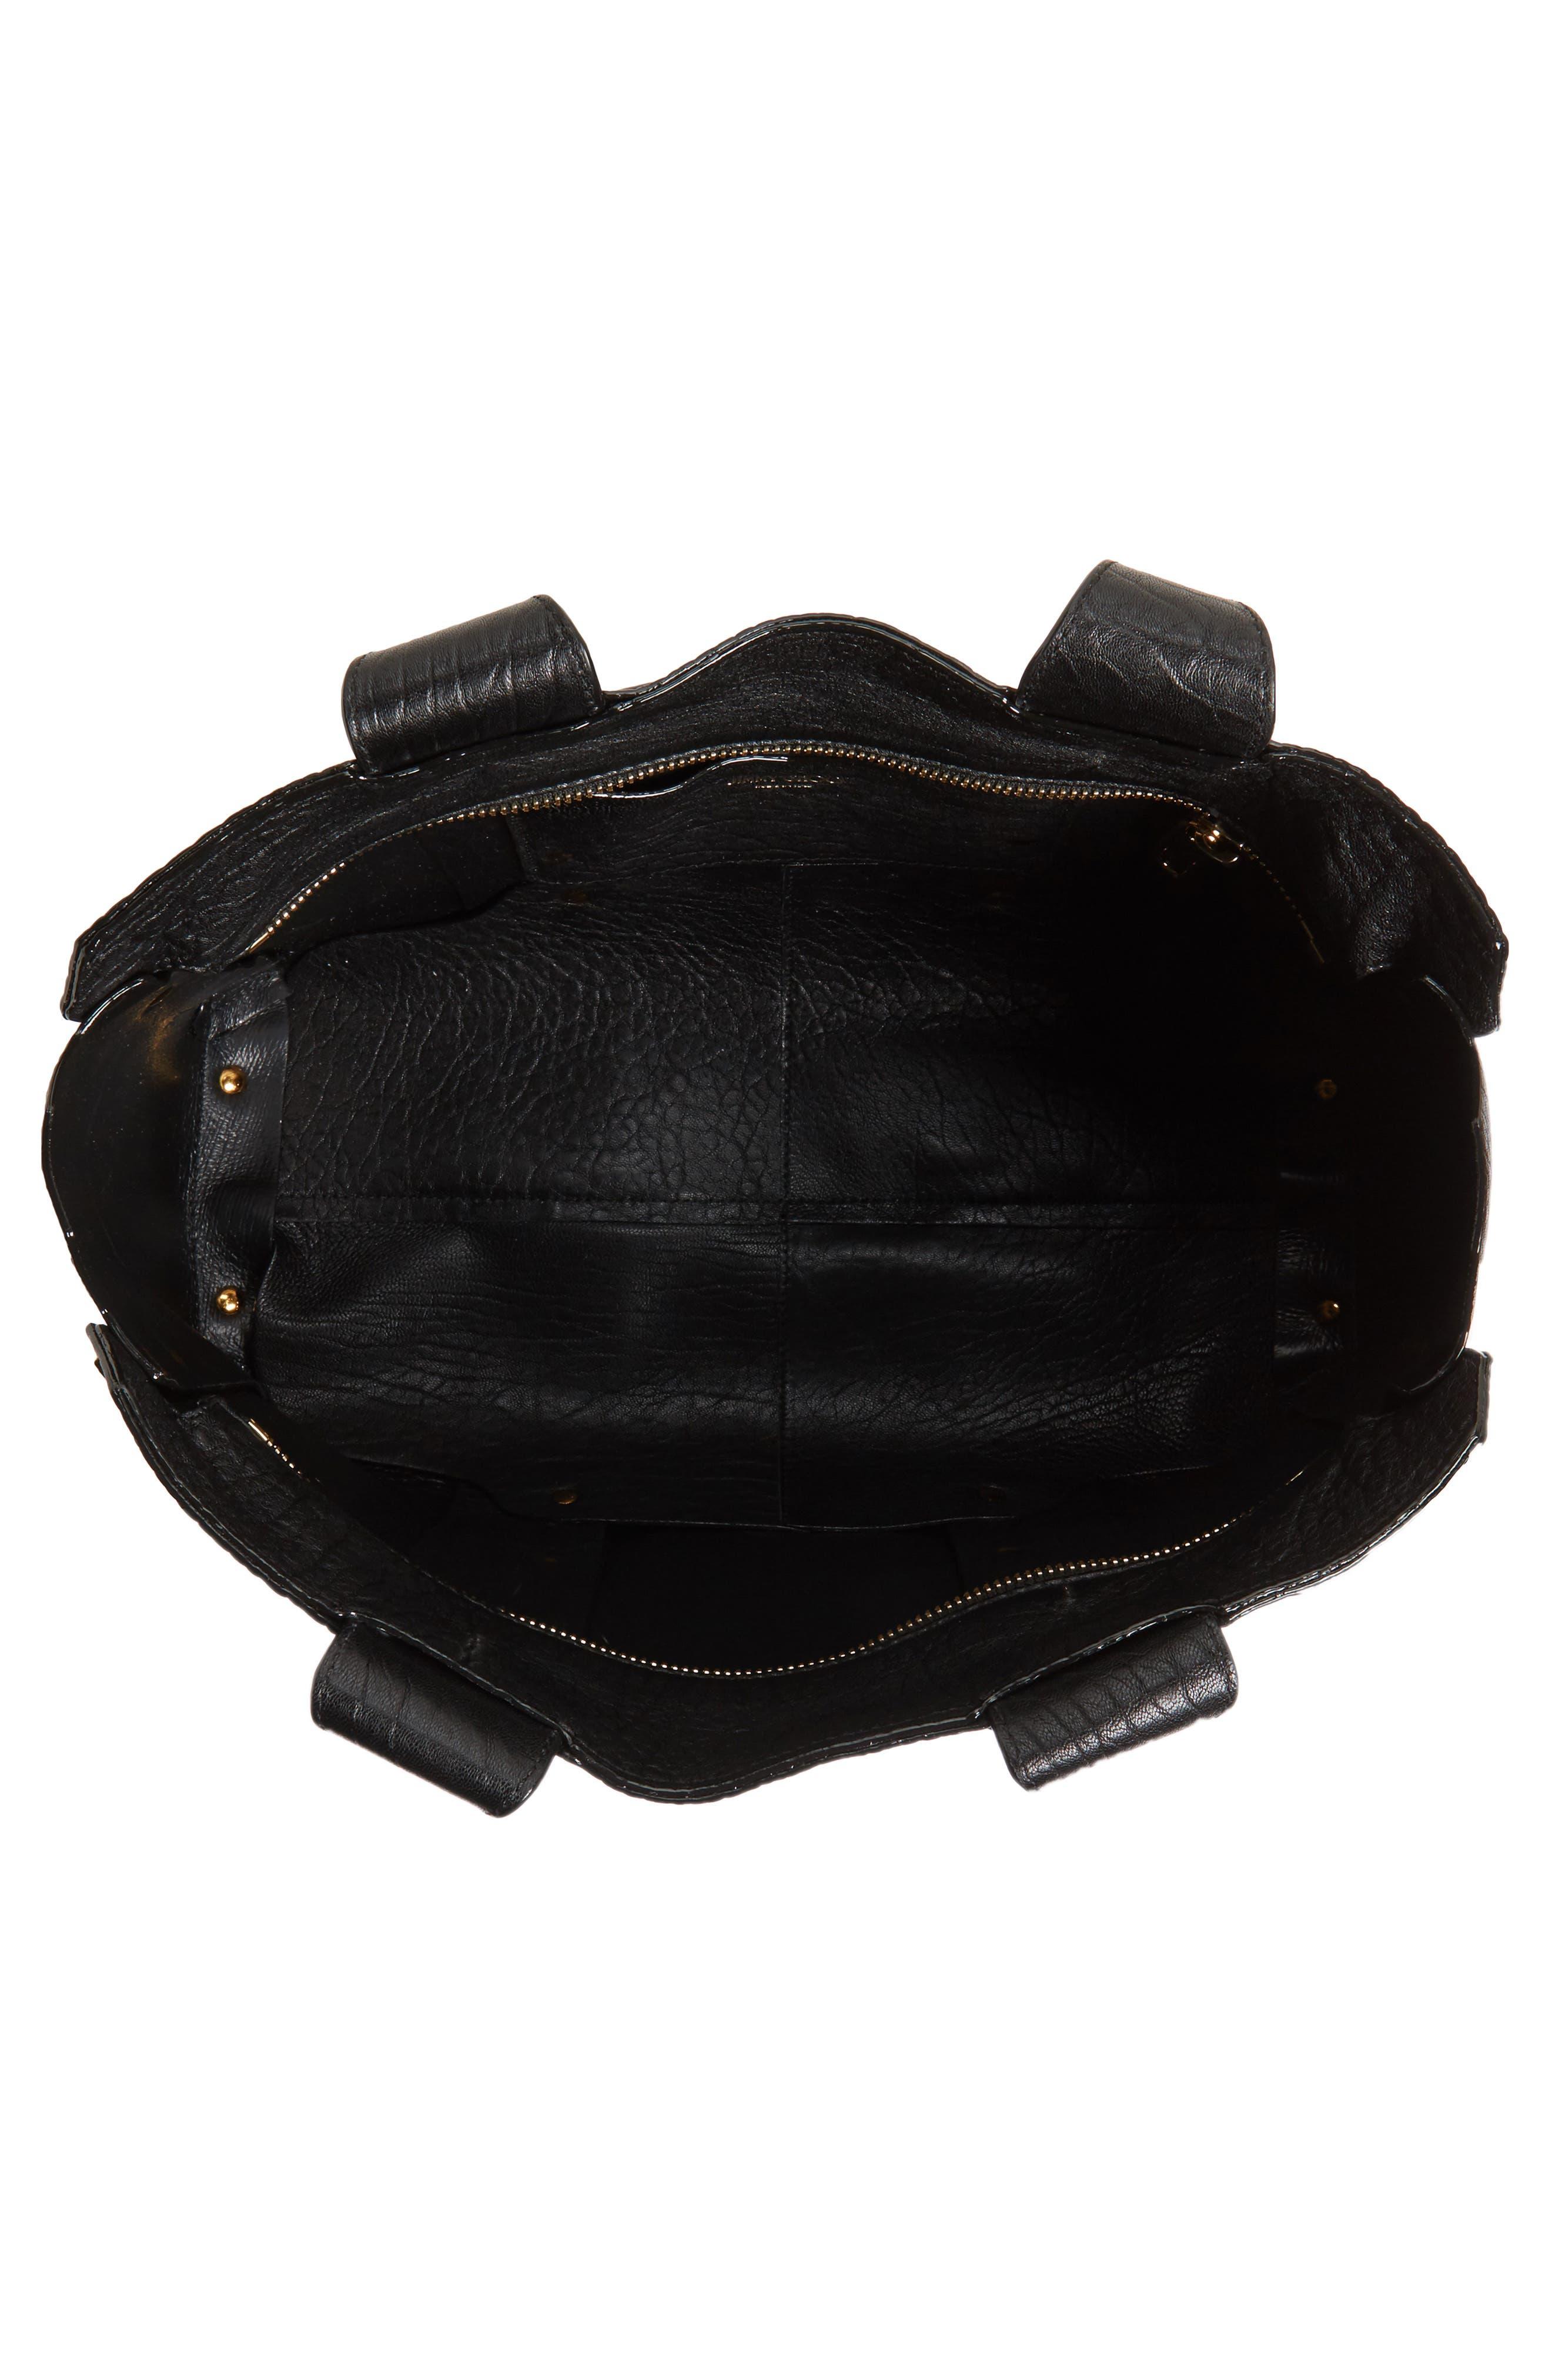 Lockett Leather Shopper,                             Alternate thumbnail 4, color,                             Black